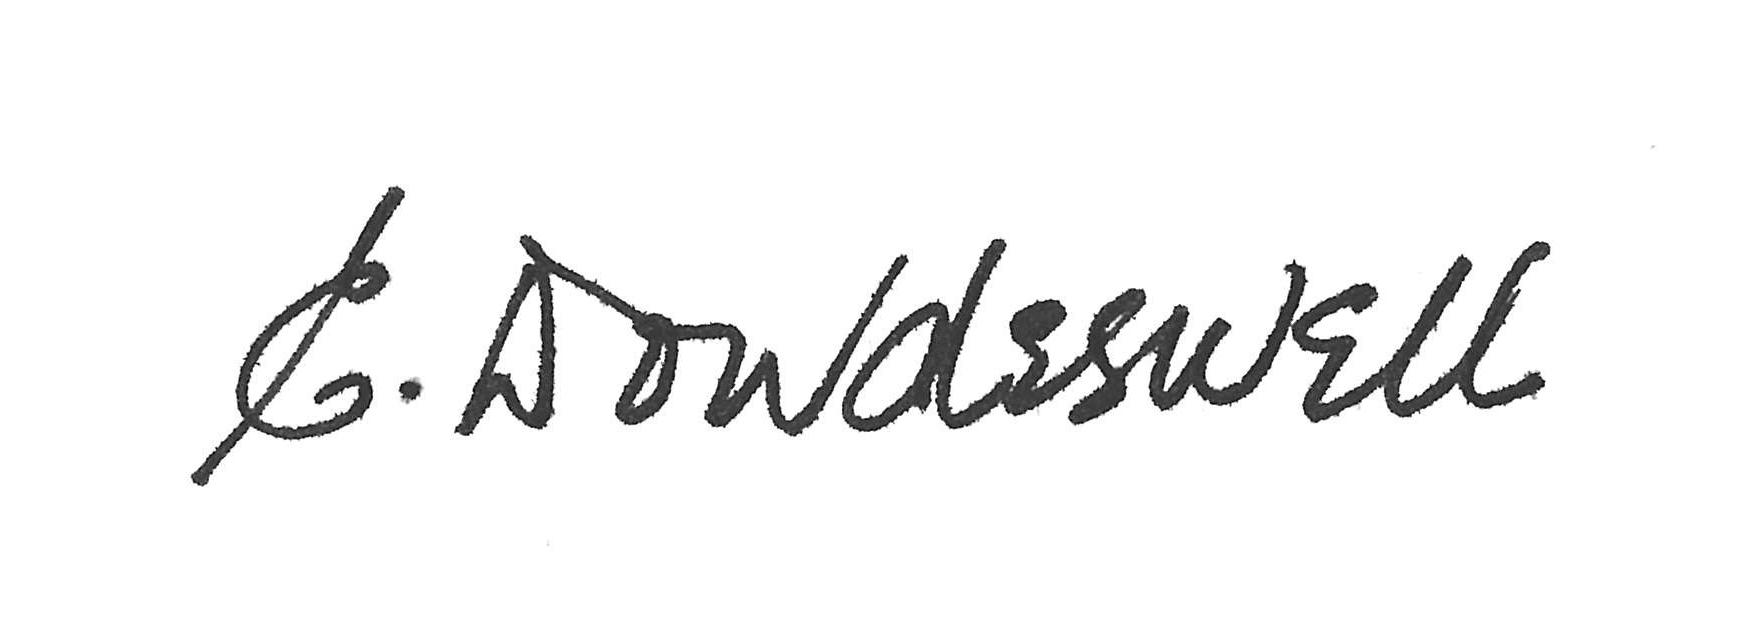 Lieutenant Governor's signature